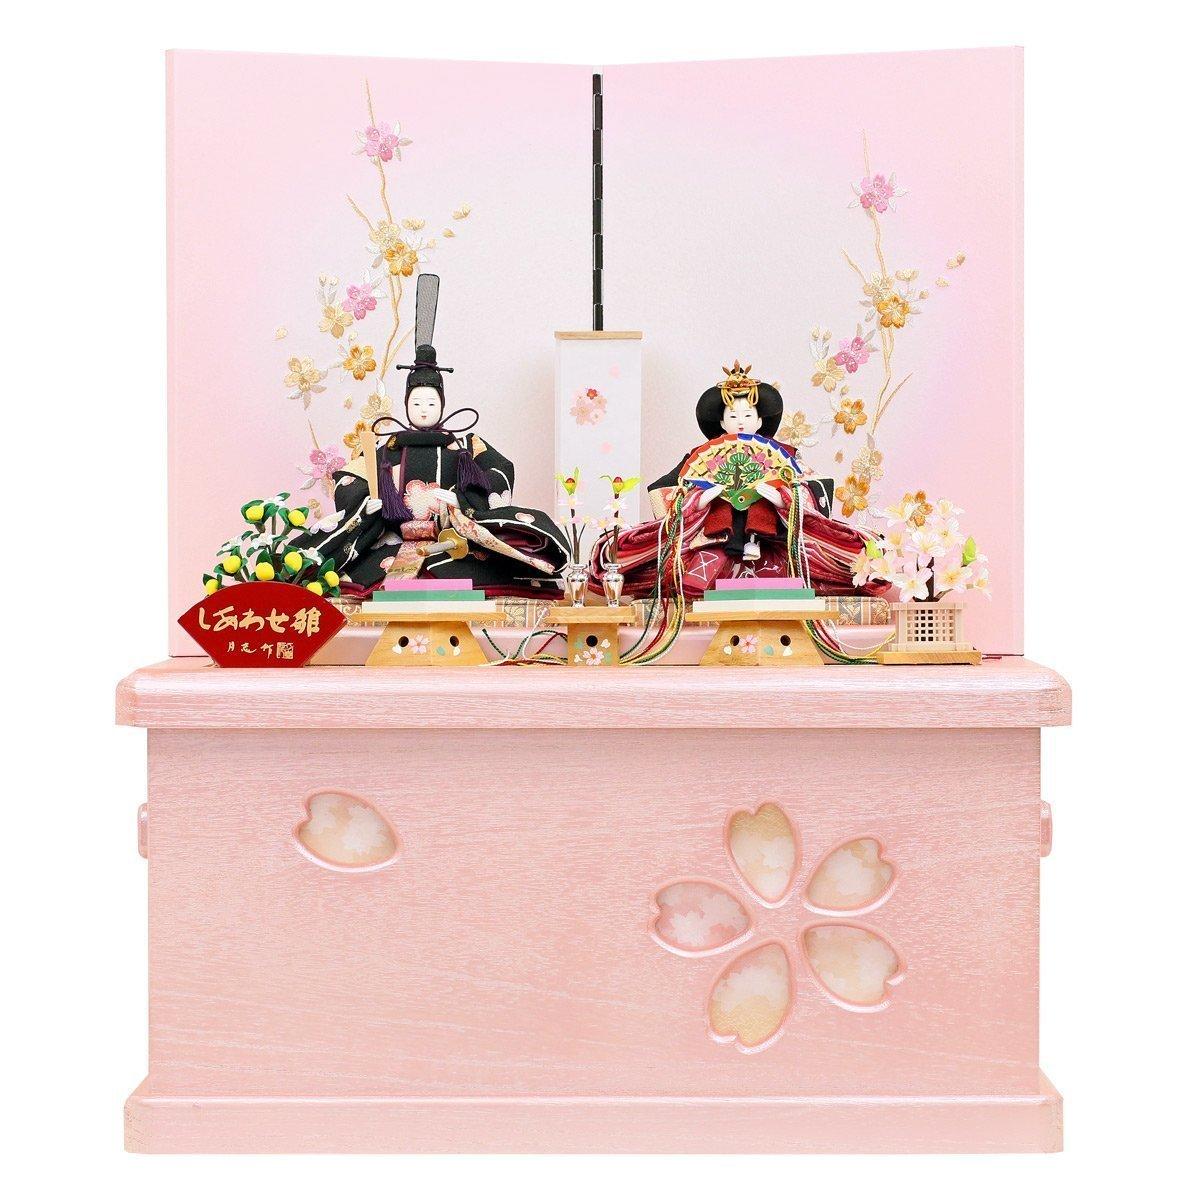 人形工房天祥 雛人形 収納飾り 親王飾り 衣装着 束帯十二単雛人形 横幅49×奥行35×高さ58(cm) 13tuki-sakurako48   B00S2DWC94